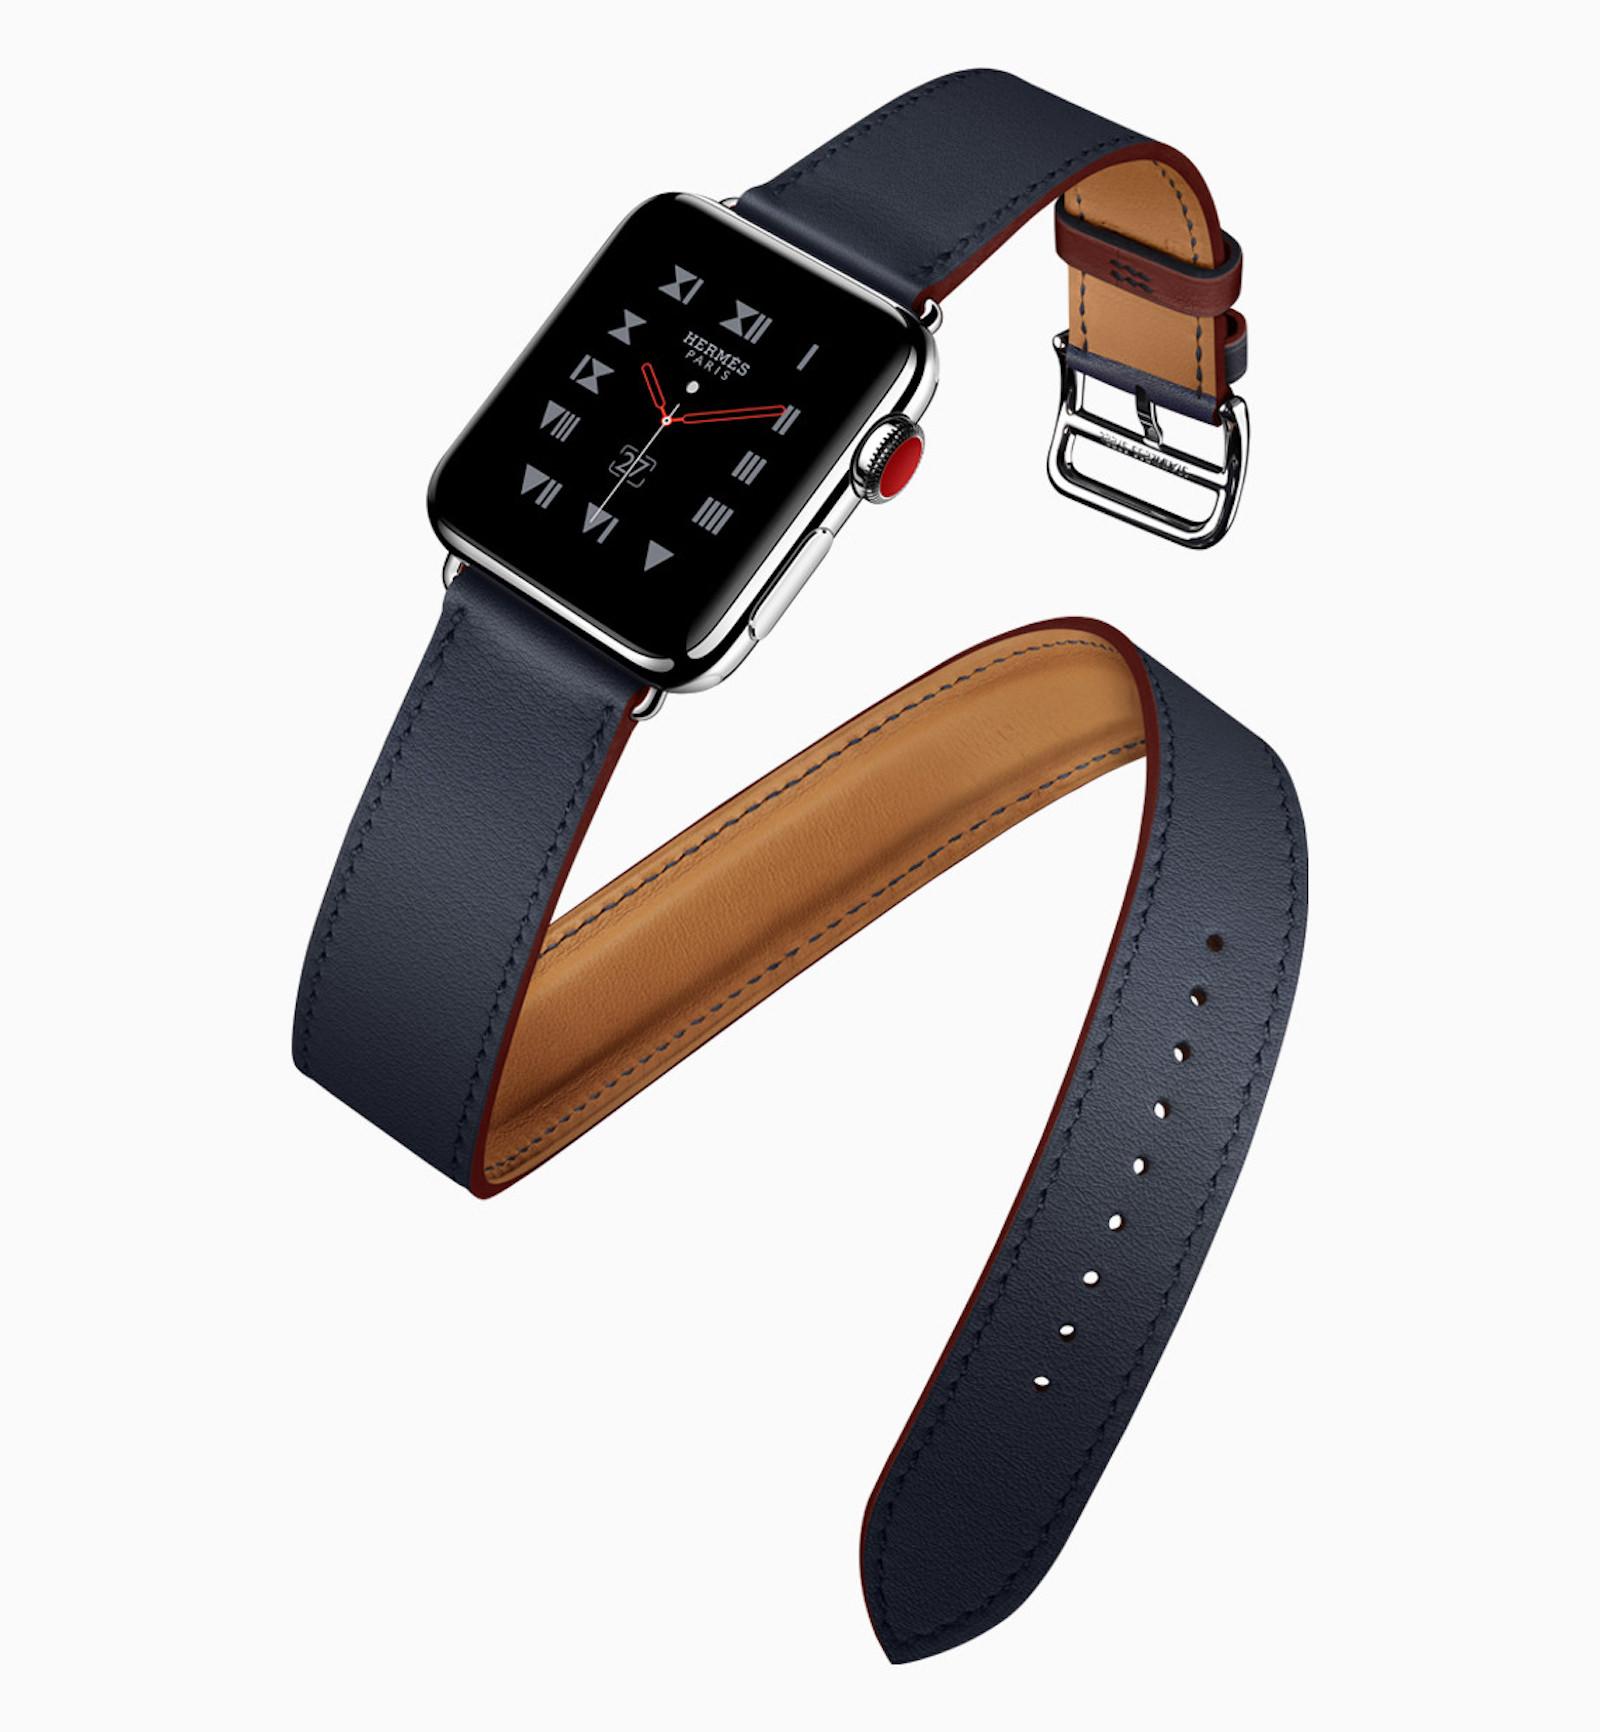 Apple-Watch-Series3_Hermes-double-tour_032118.jpg